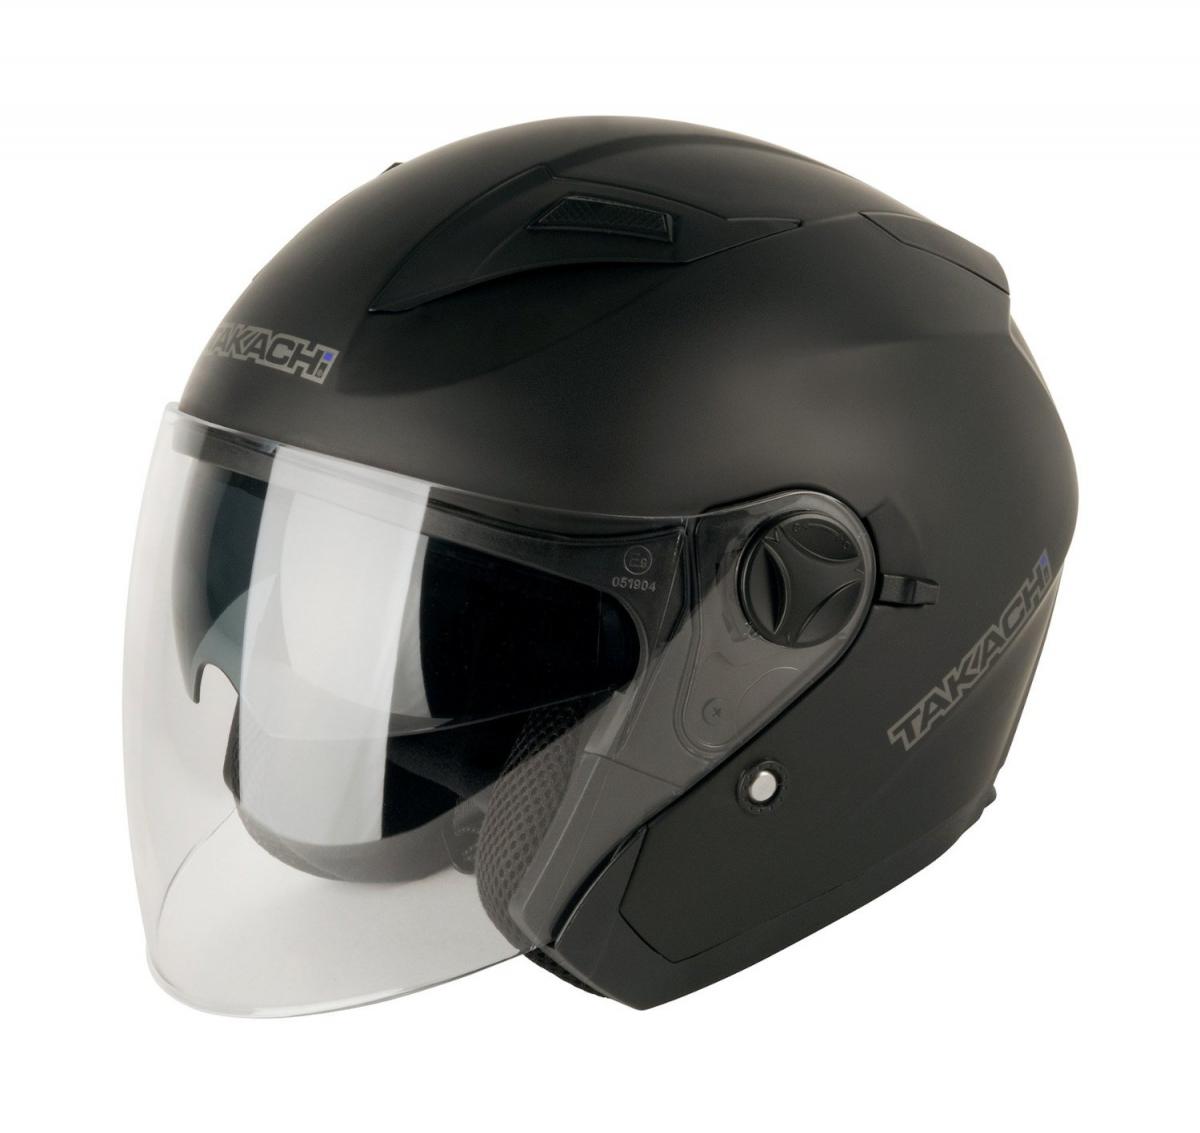 МОТОШЛЕМ TAKACHI TKR-27 SATIN BLACK  Артмото - купить квадроцикл в украине и харькове, мотоцикл, снегоход, скутер, мопед, электромобиль